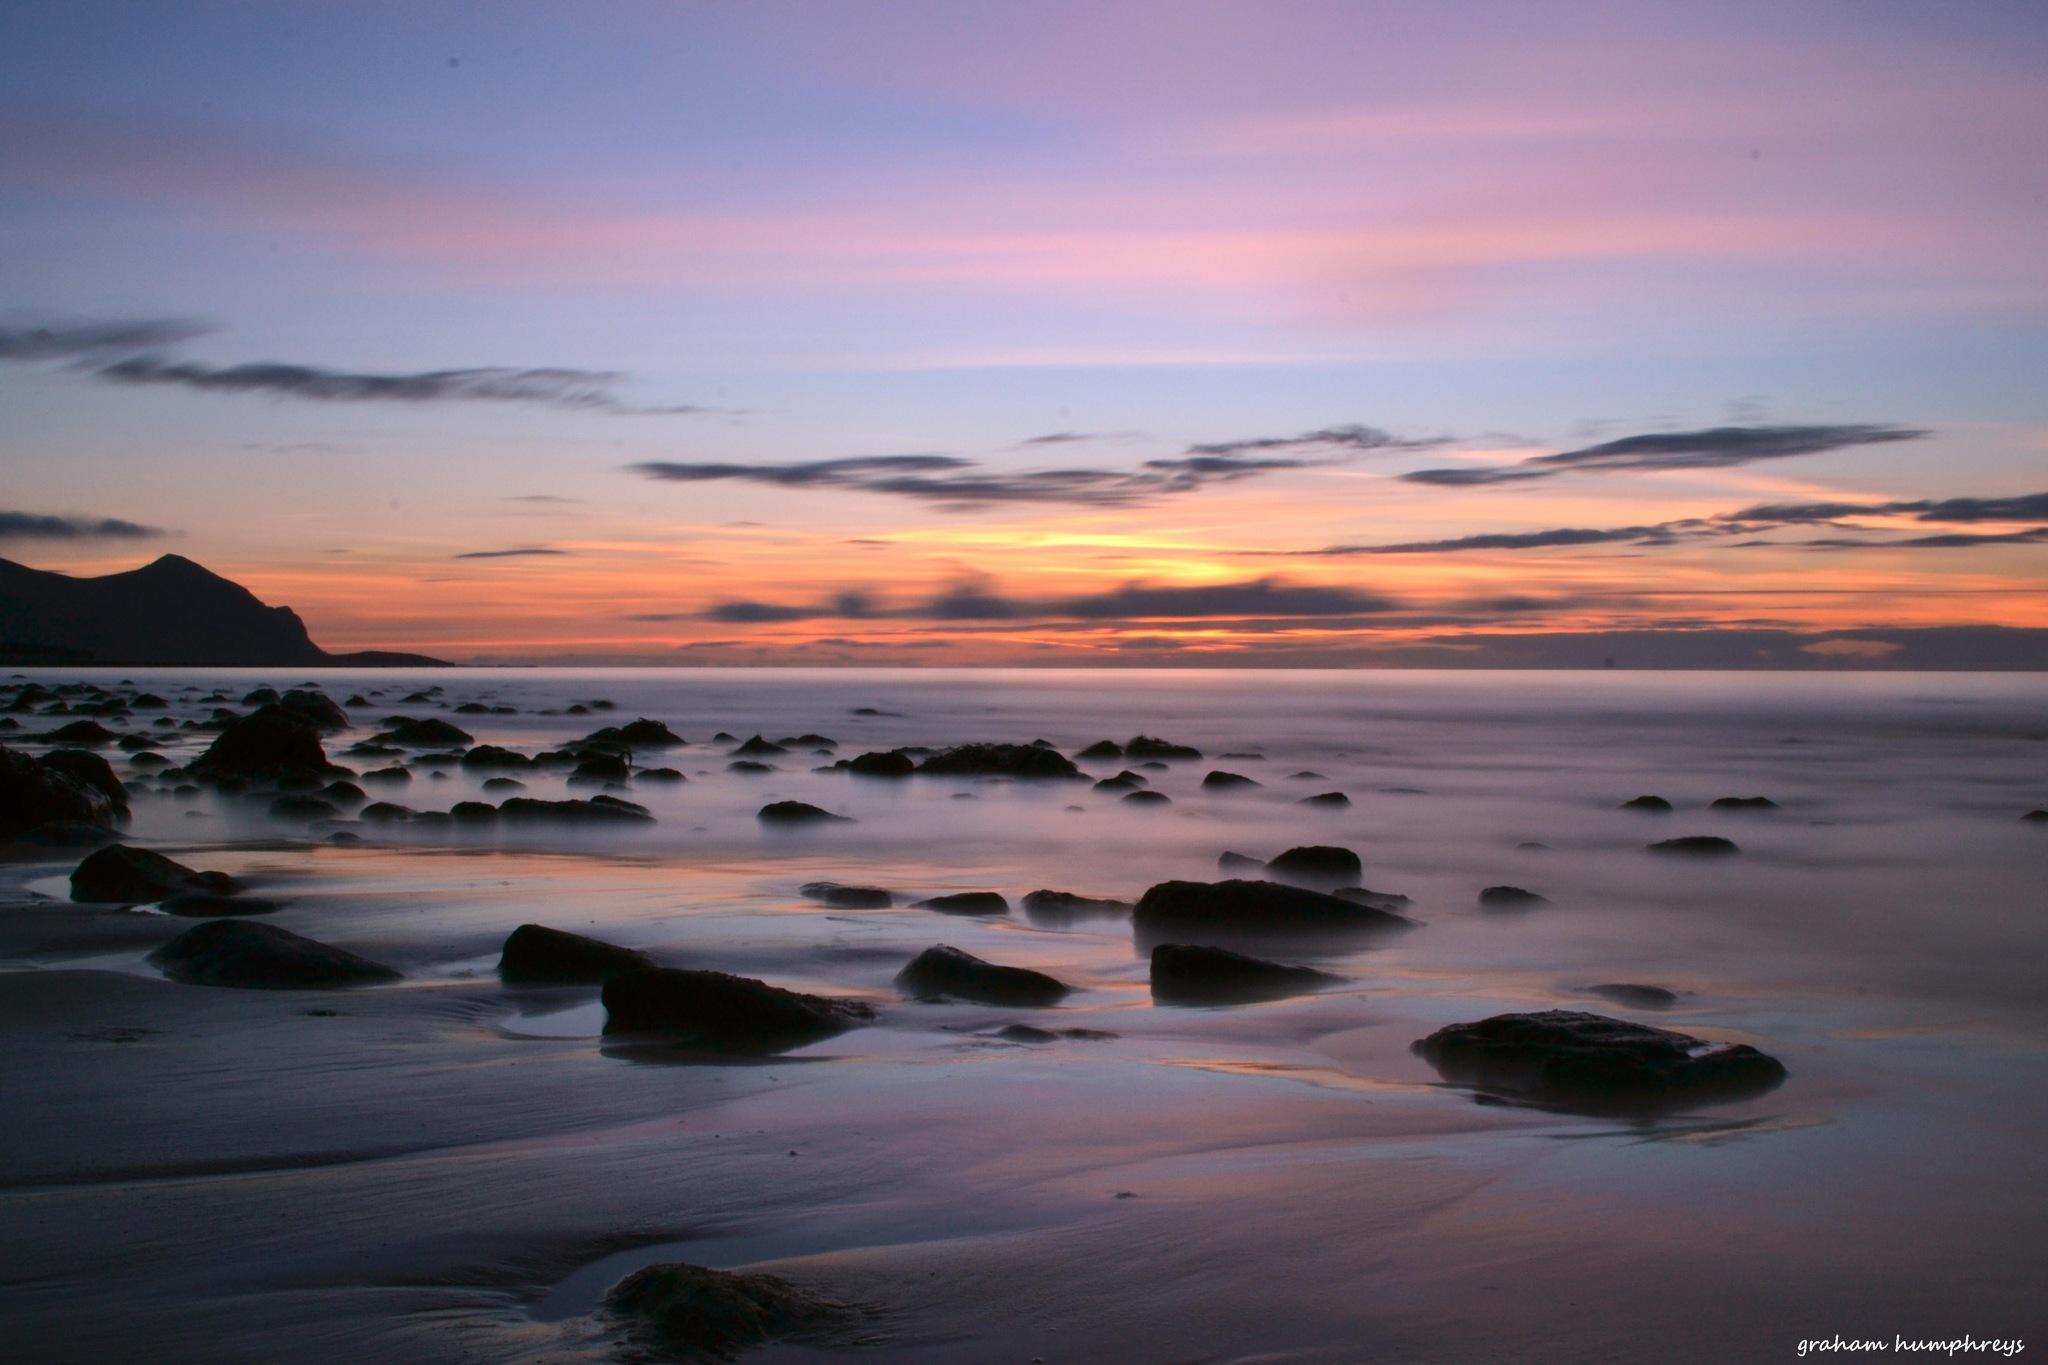 Aberdesach beach by graham humphreys